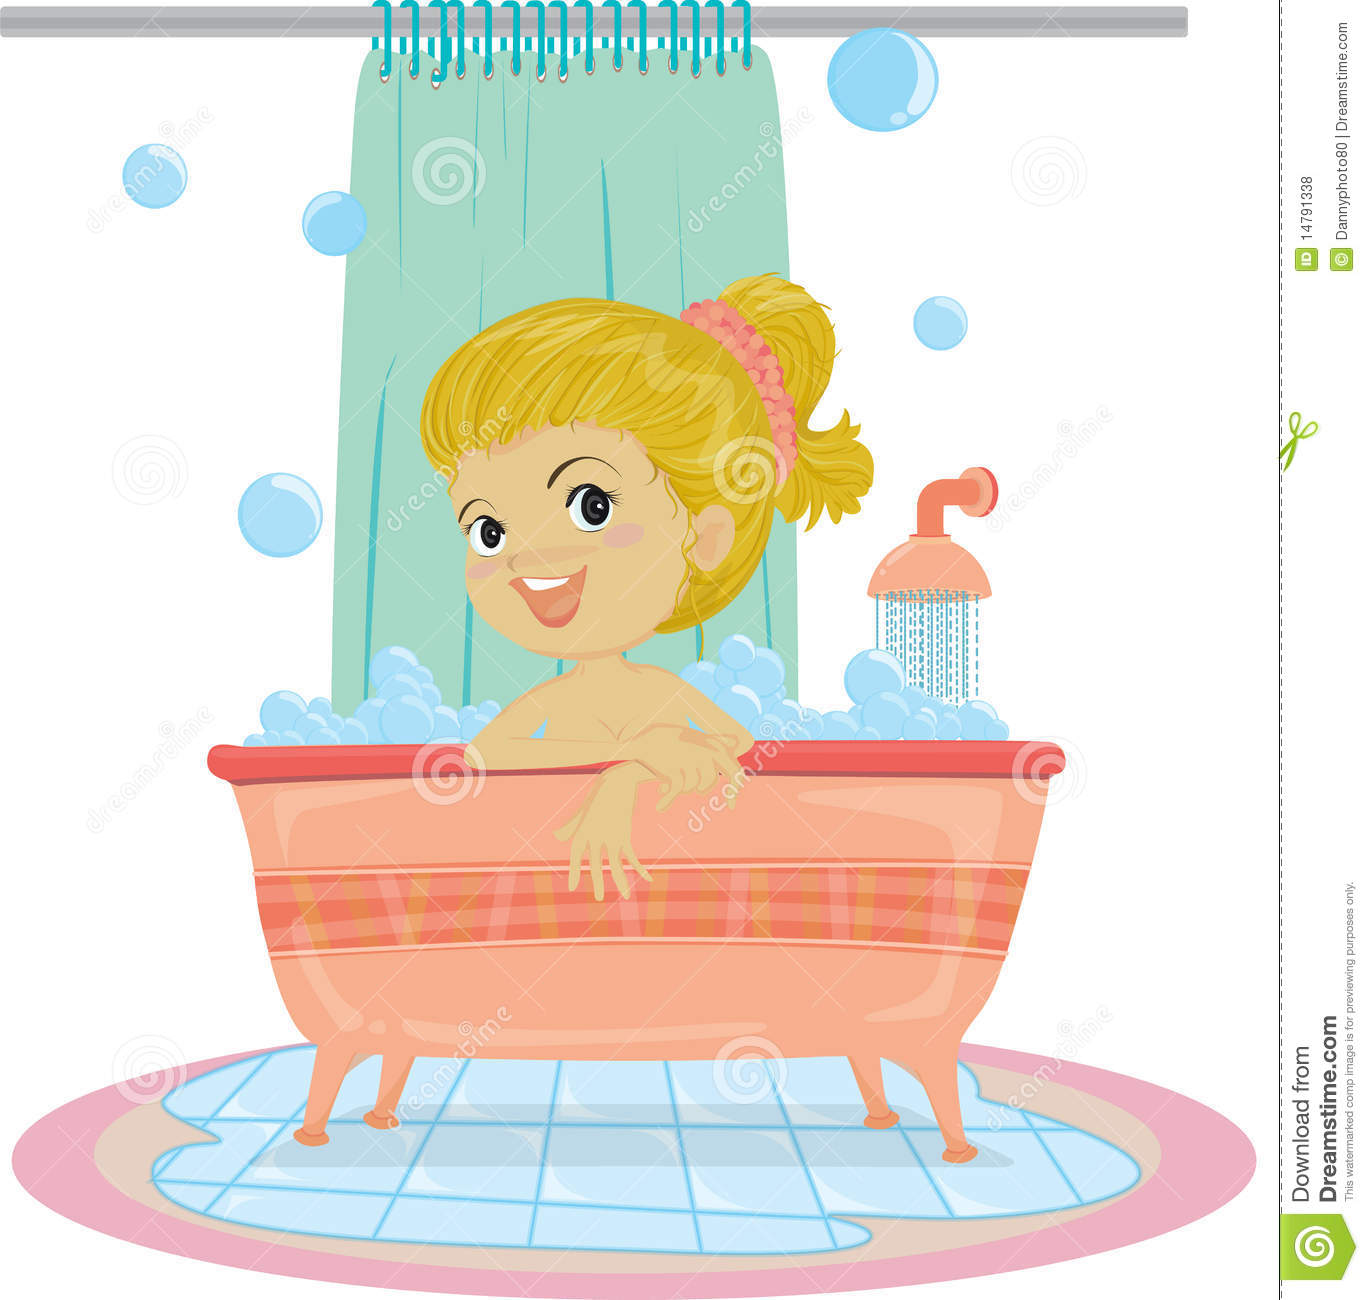 Bathroom clipart illustration, Bathroom illustration.